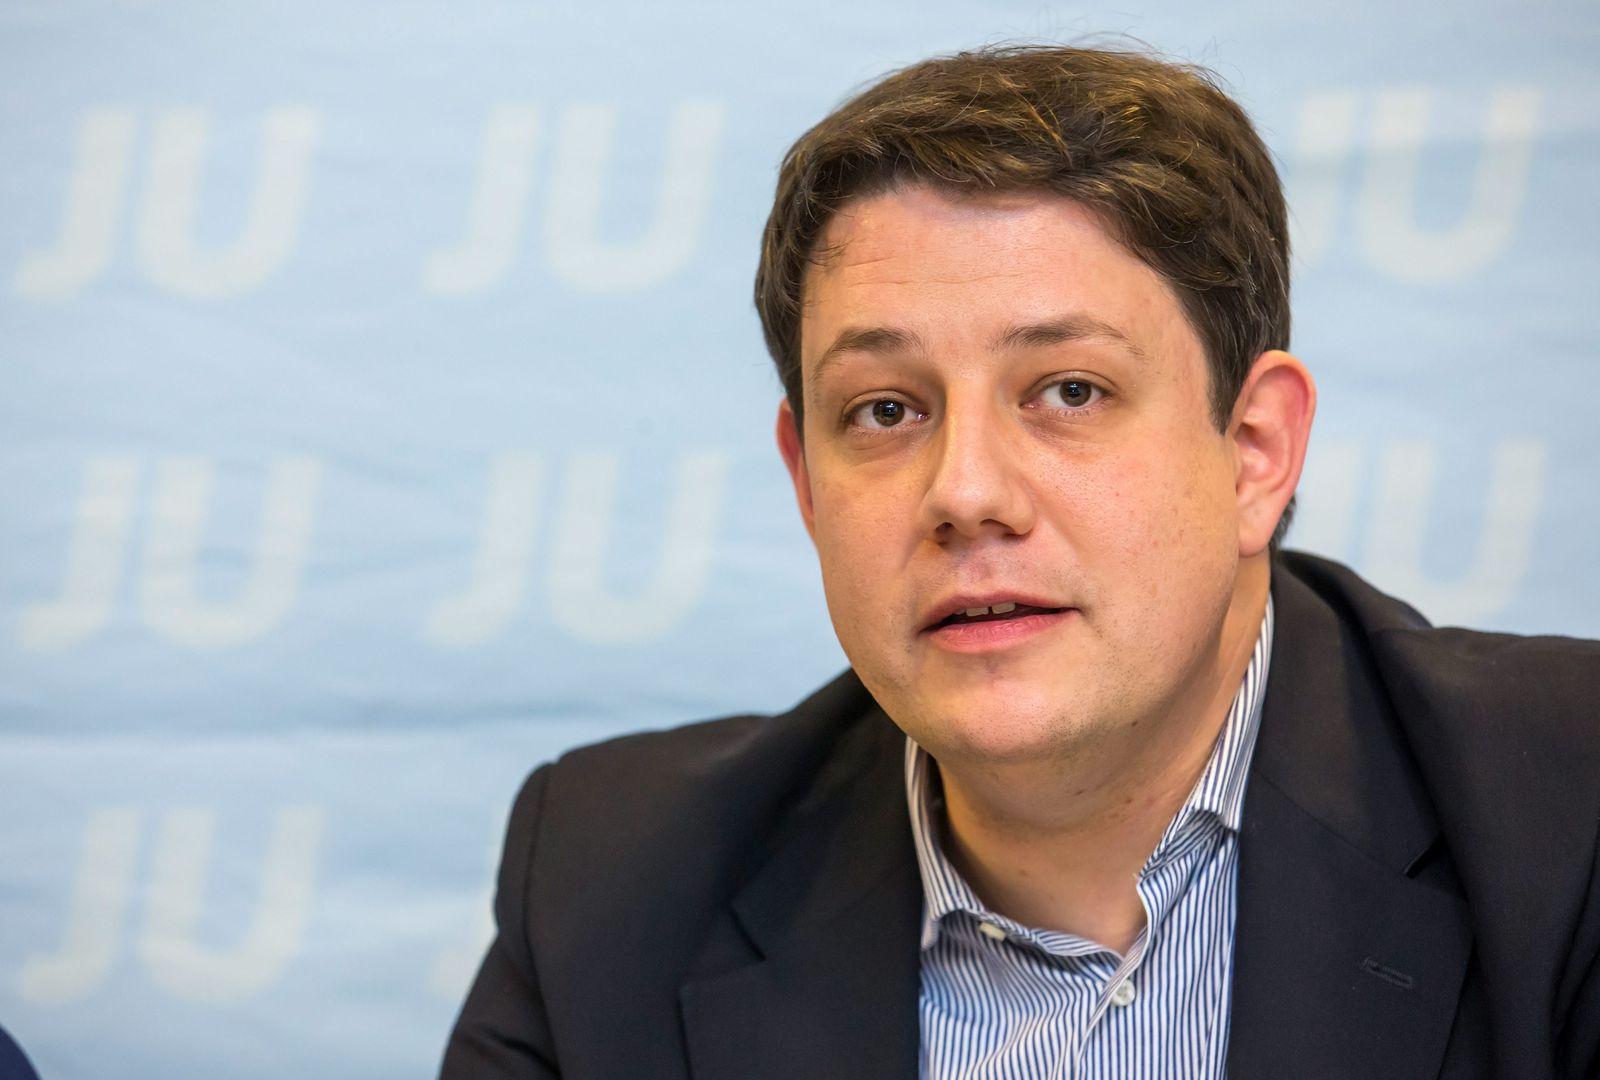 Philipp Mißfelder/ Junge Union